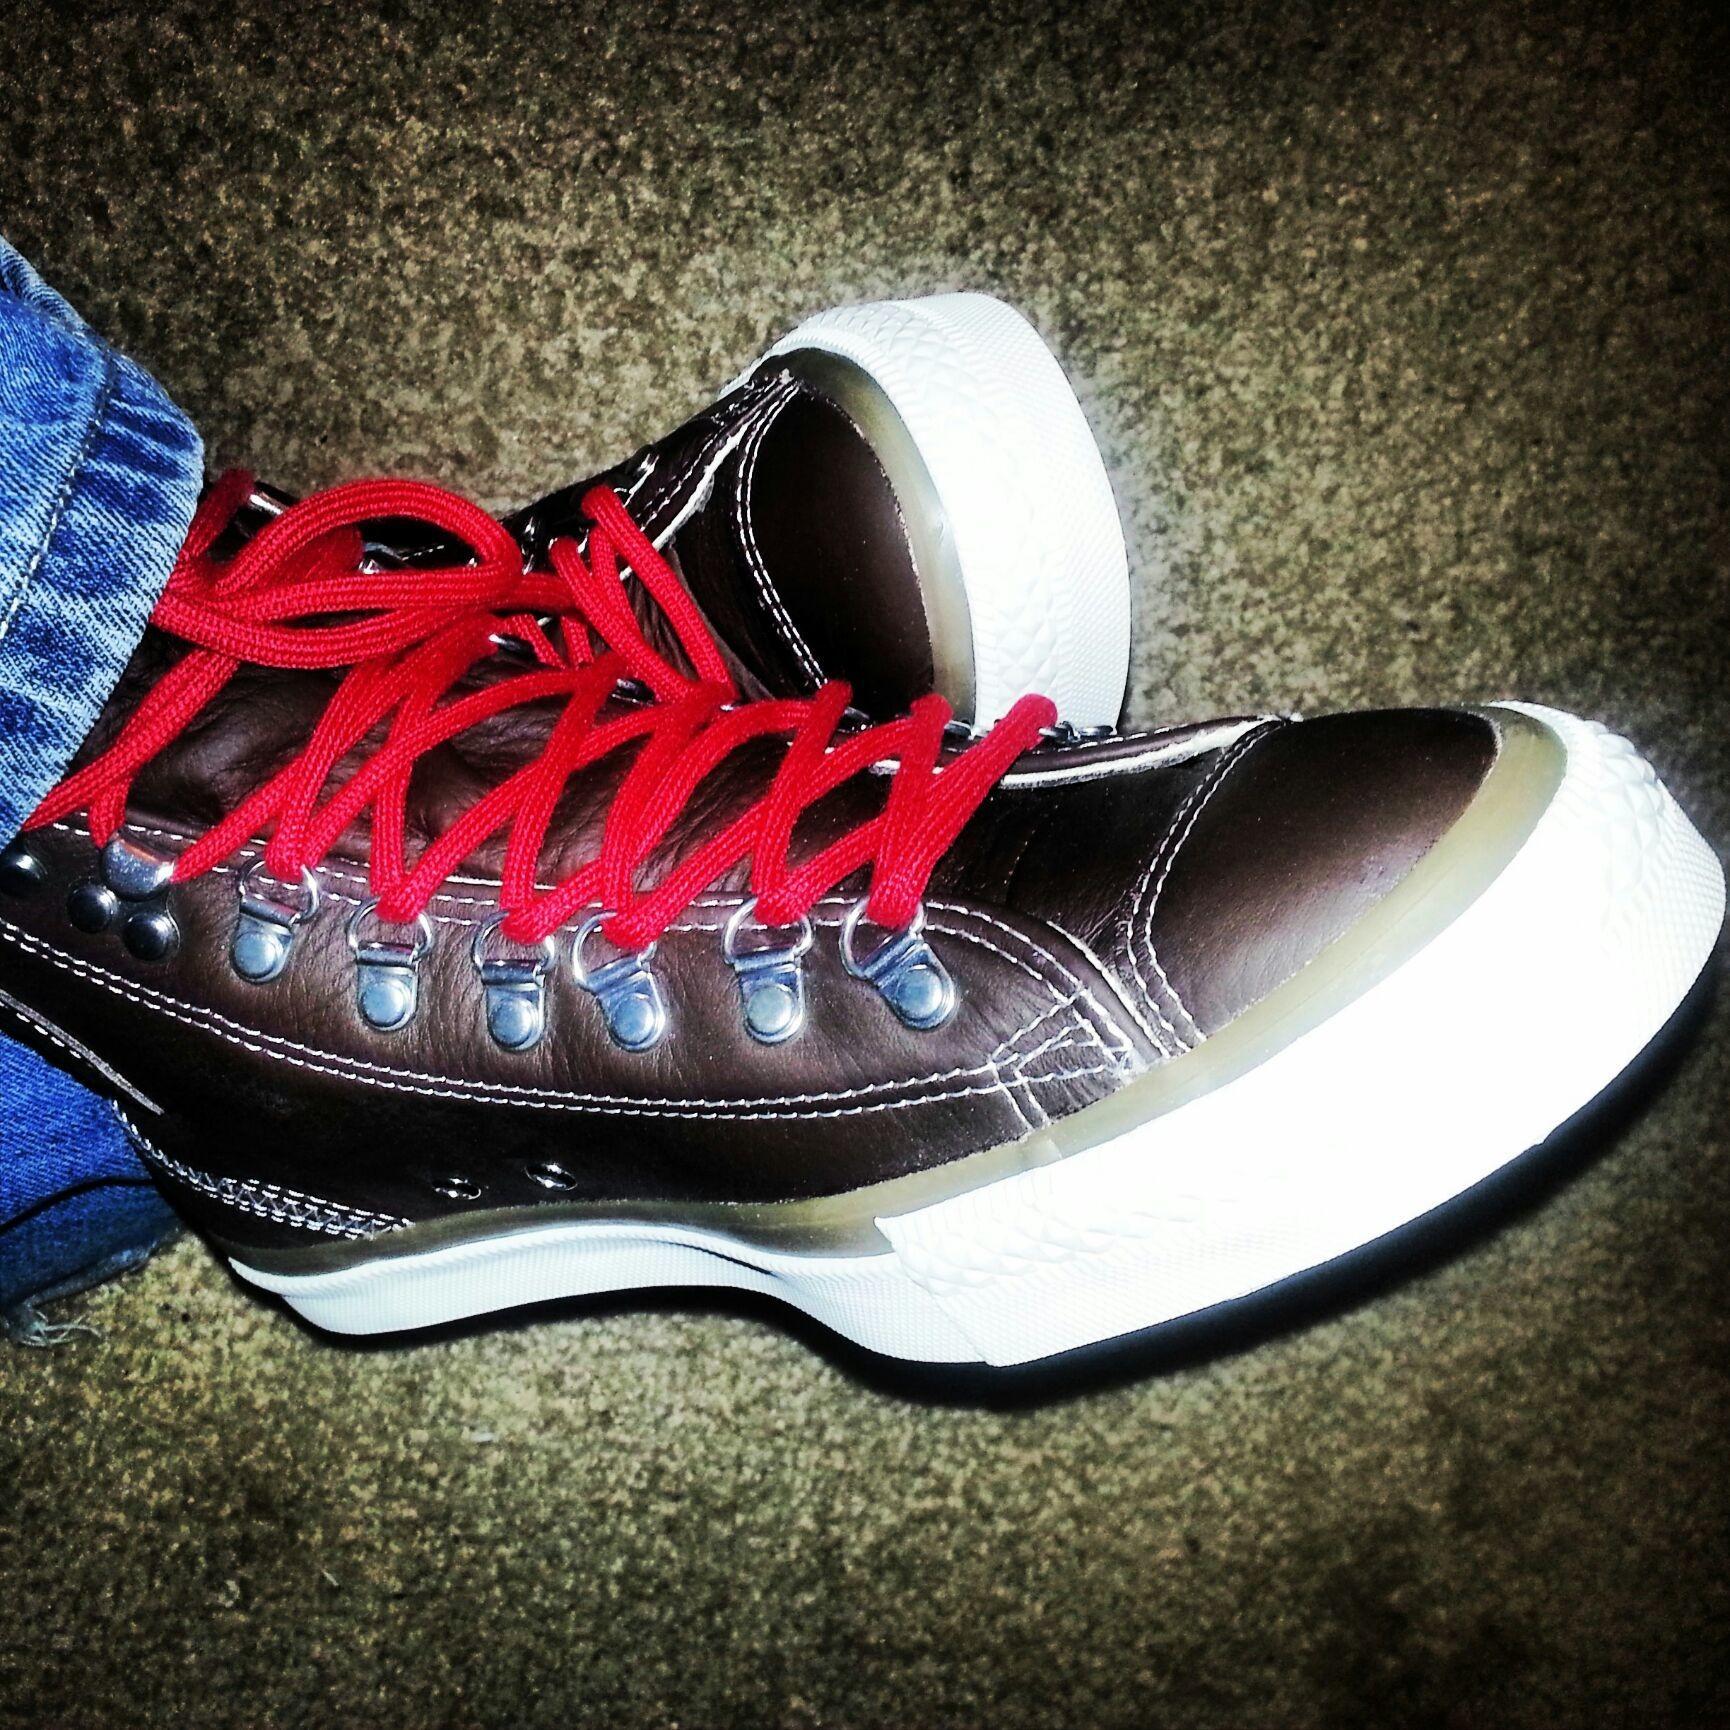 My favorite Chocolate Chucks. Get yo Converse on! #chuckhack #allstar